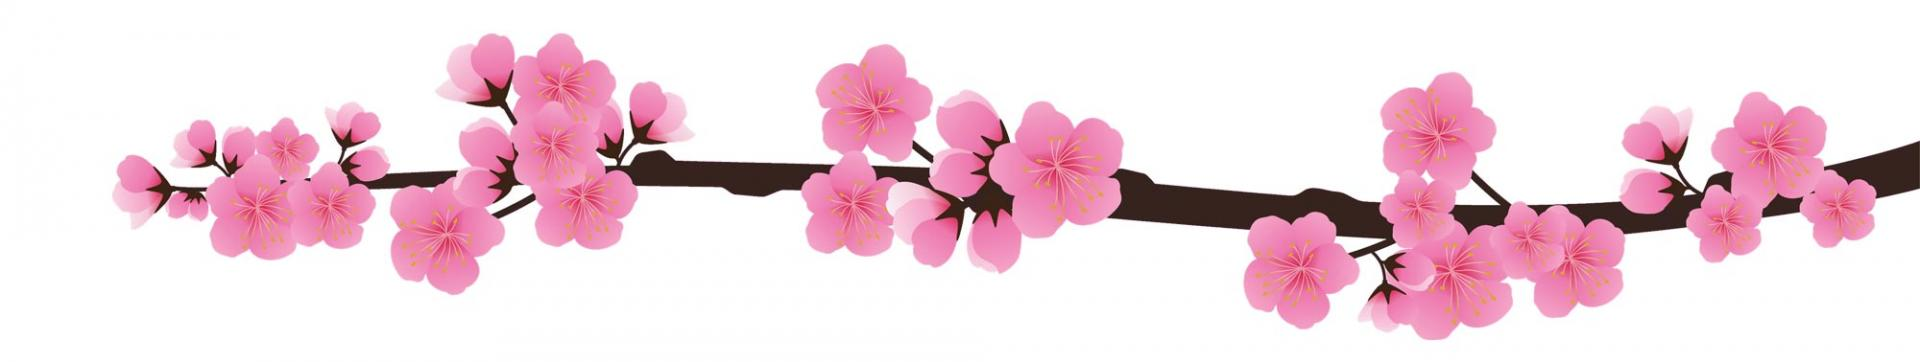 Sakura pour en tete haut png